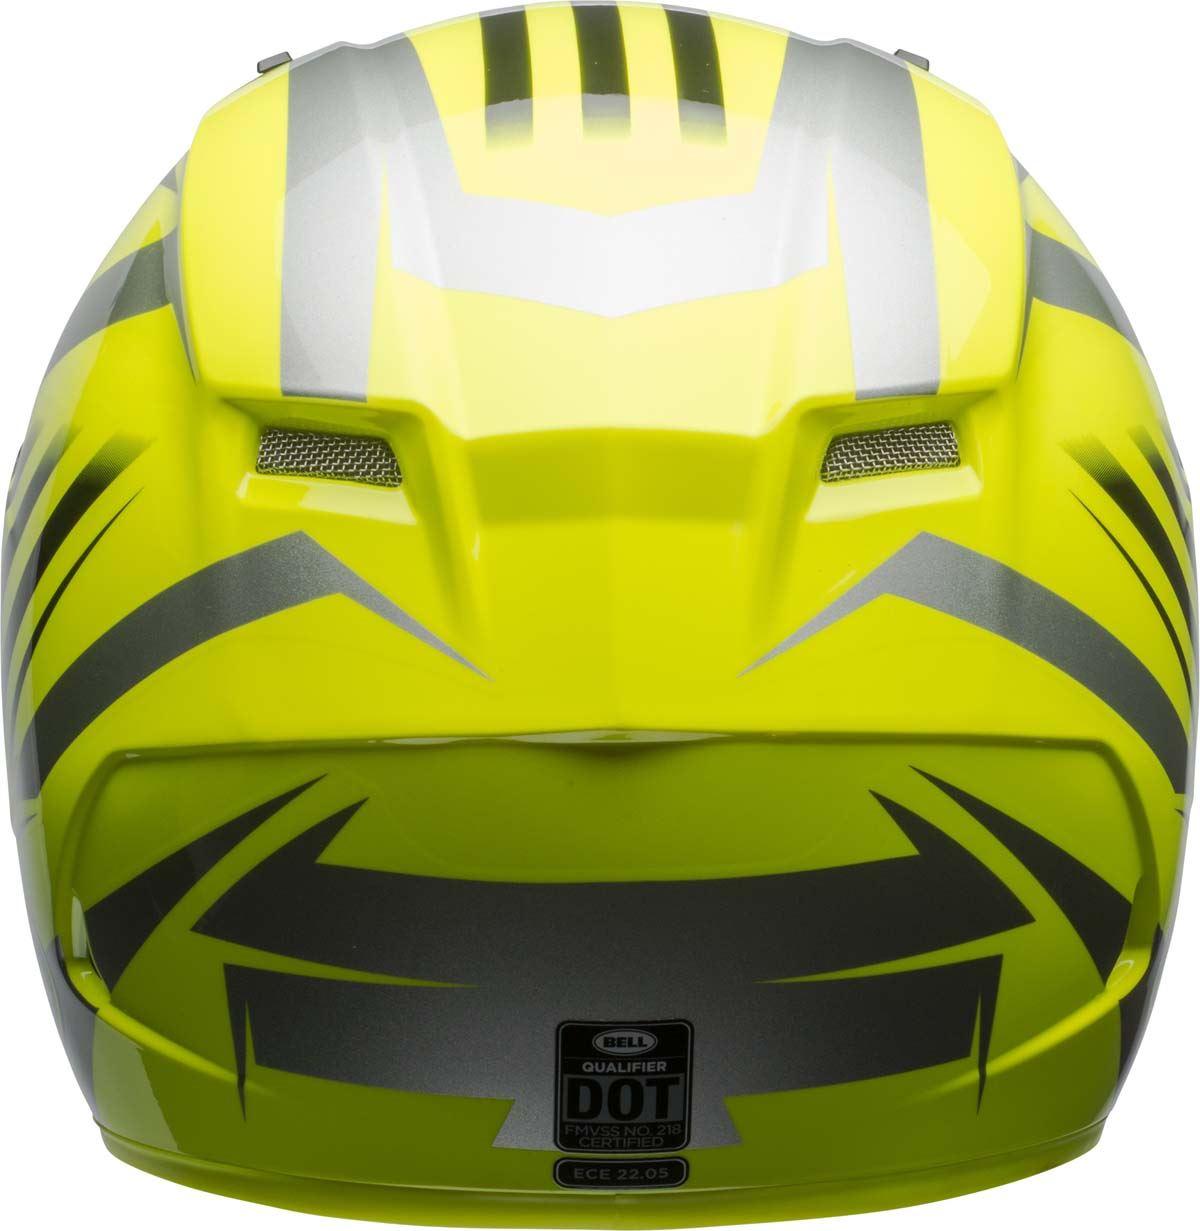 Bell-Qualifier-Helmet-Full-Face-Motorcycle-Clear-Shield-DOT-XS-3XL miniature 44